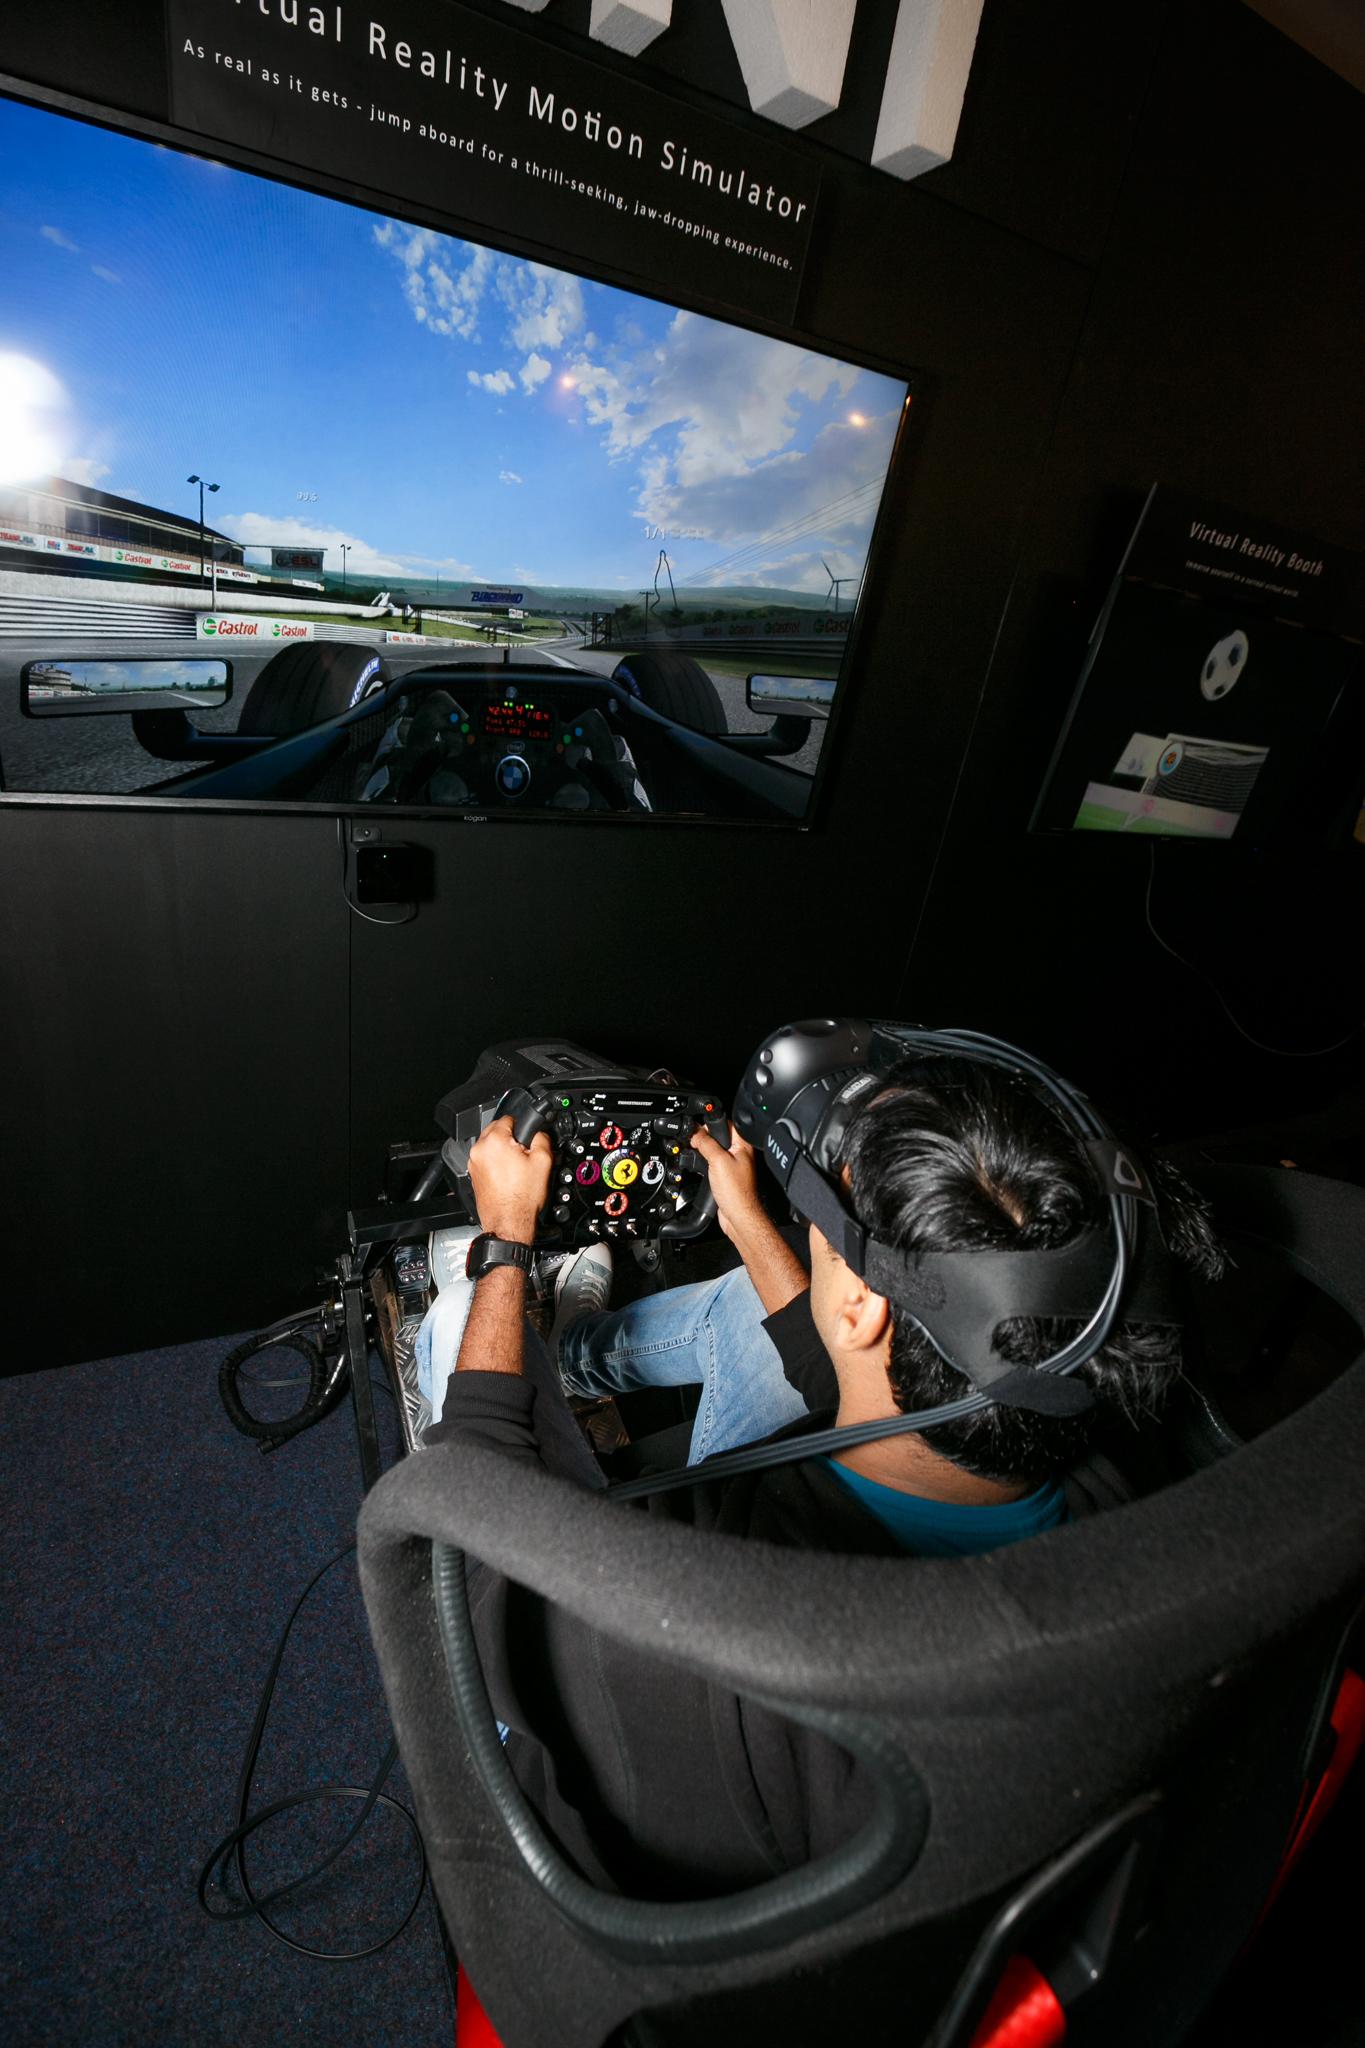 rentertainment-vr-motion-simulator-7 - Rentertainment